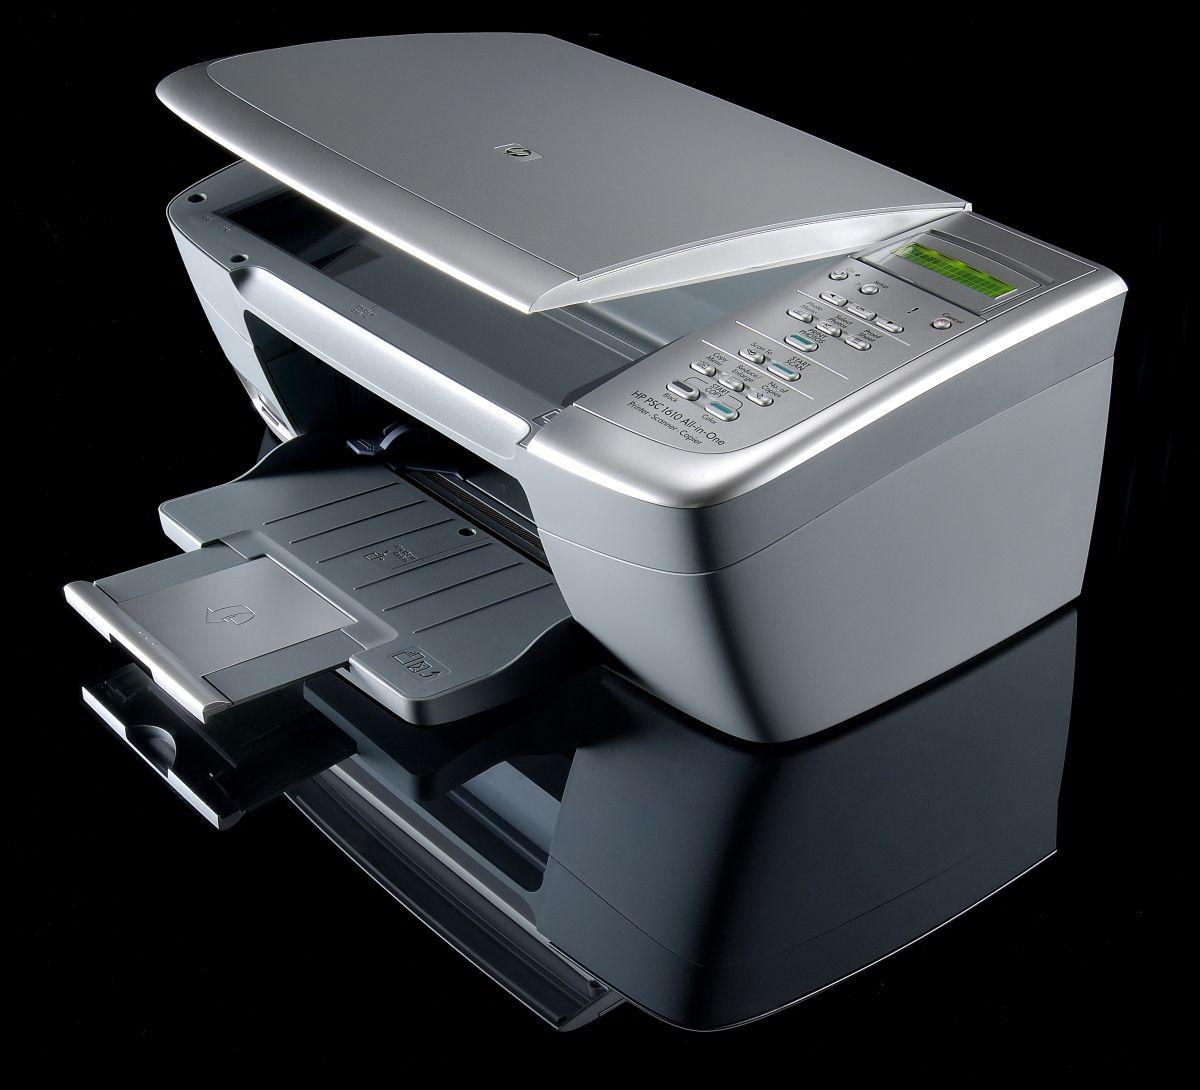 hp laserjet 1300 driver windows xp free download